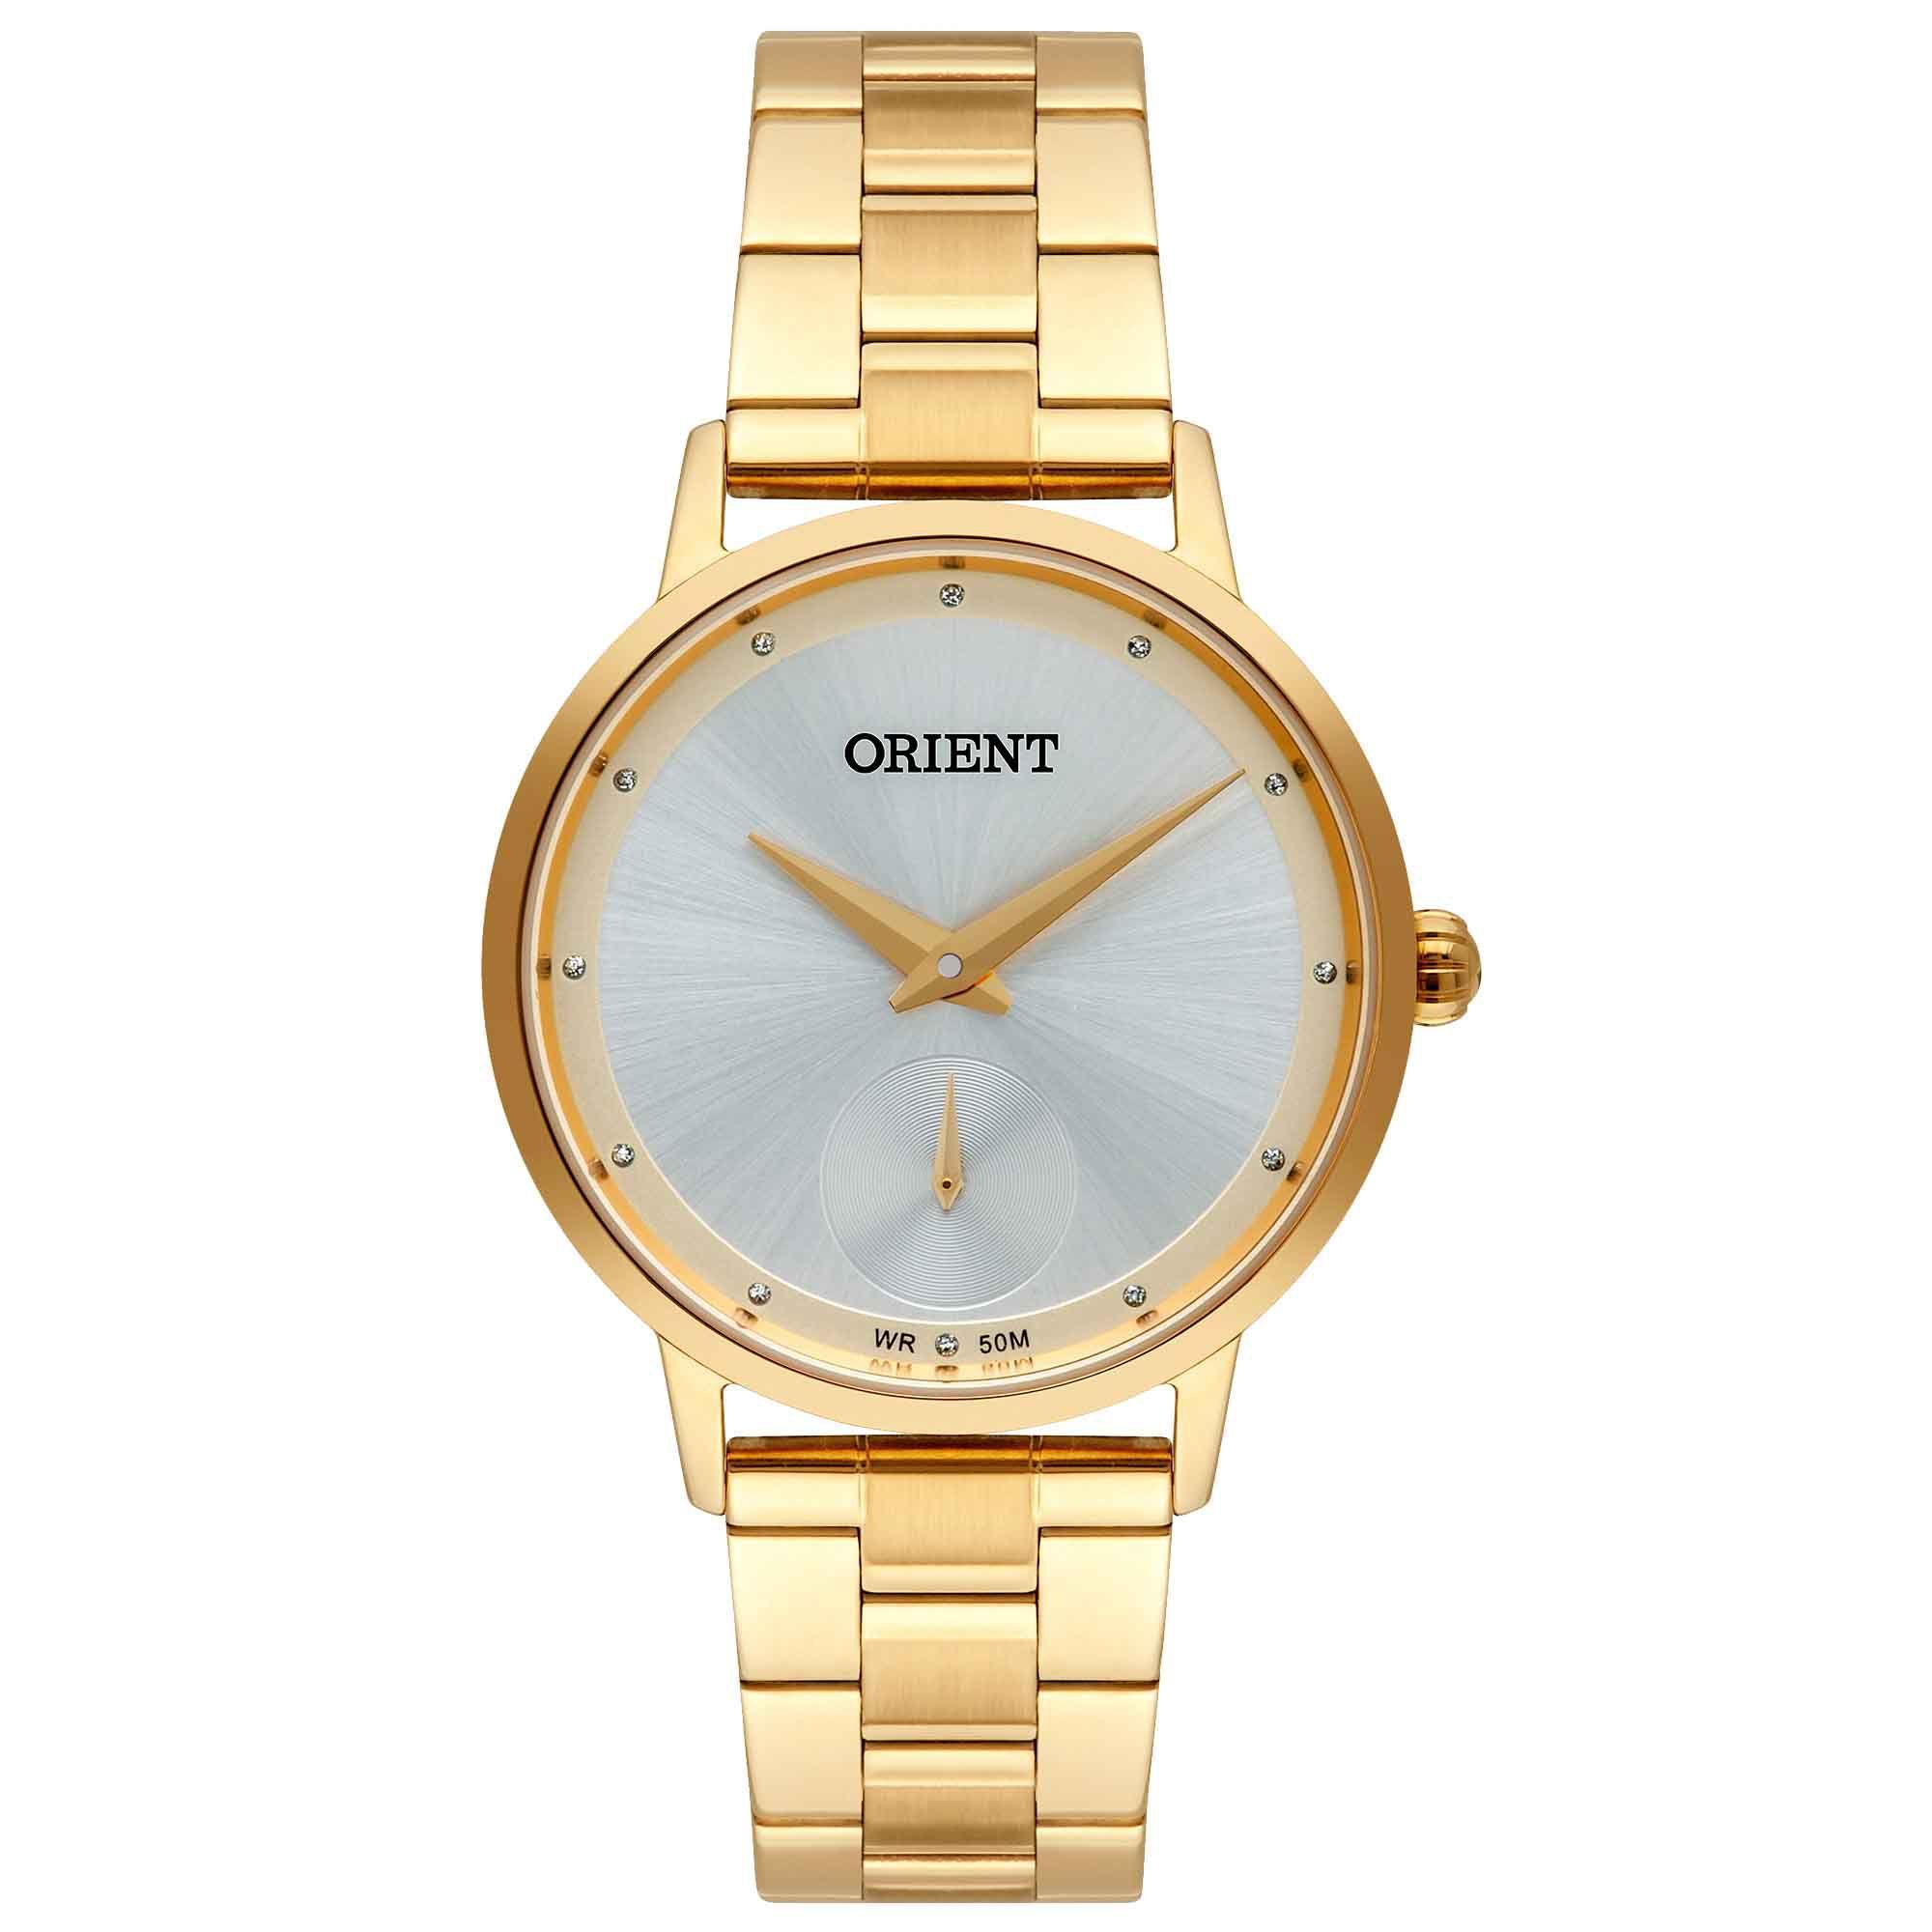 Relógio Feminino Orient FGSS0135 S1KX